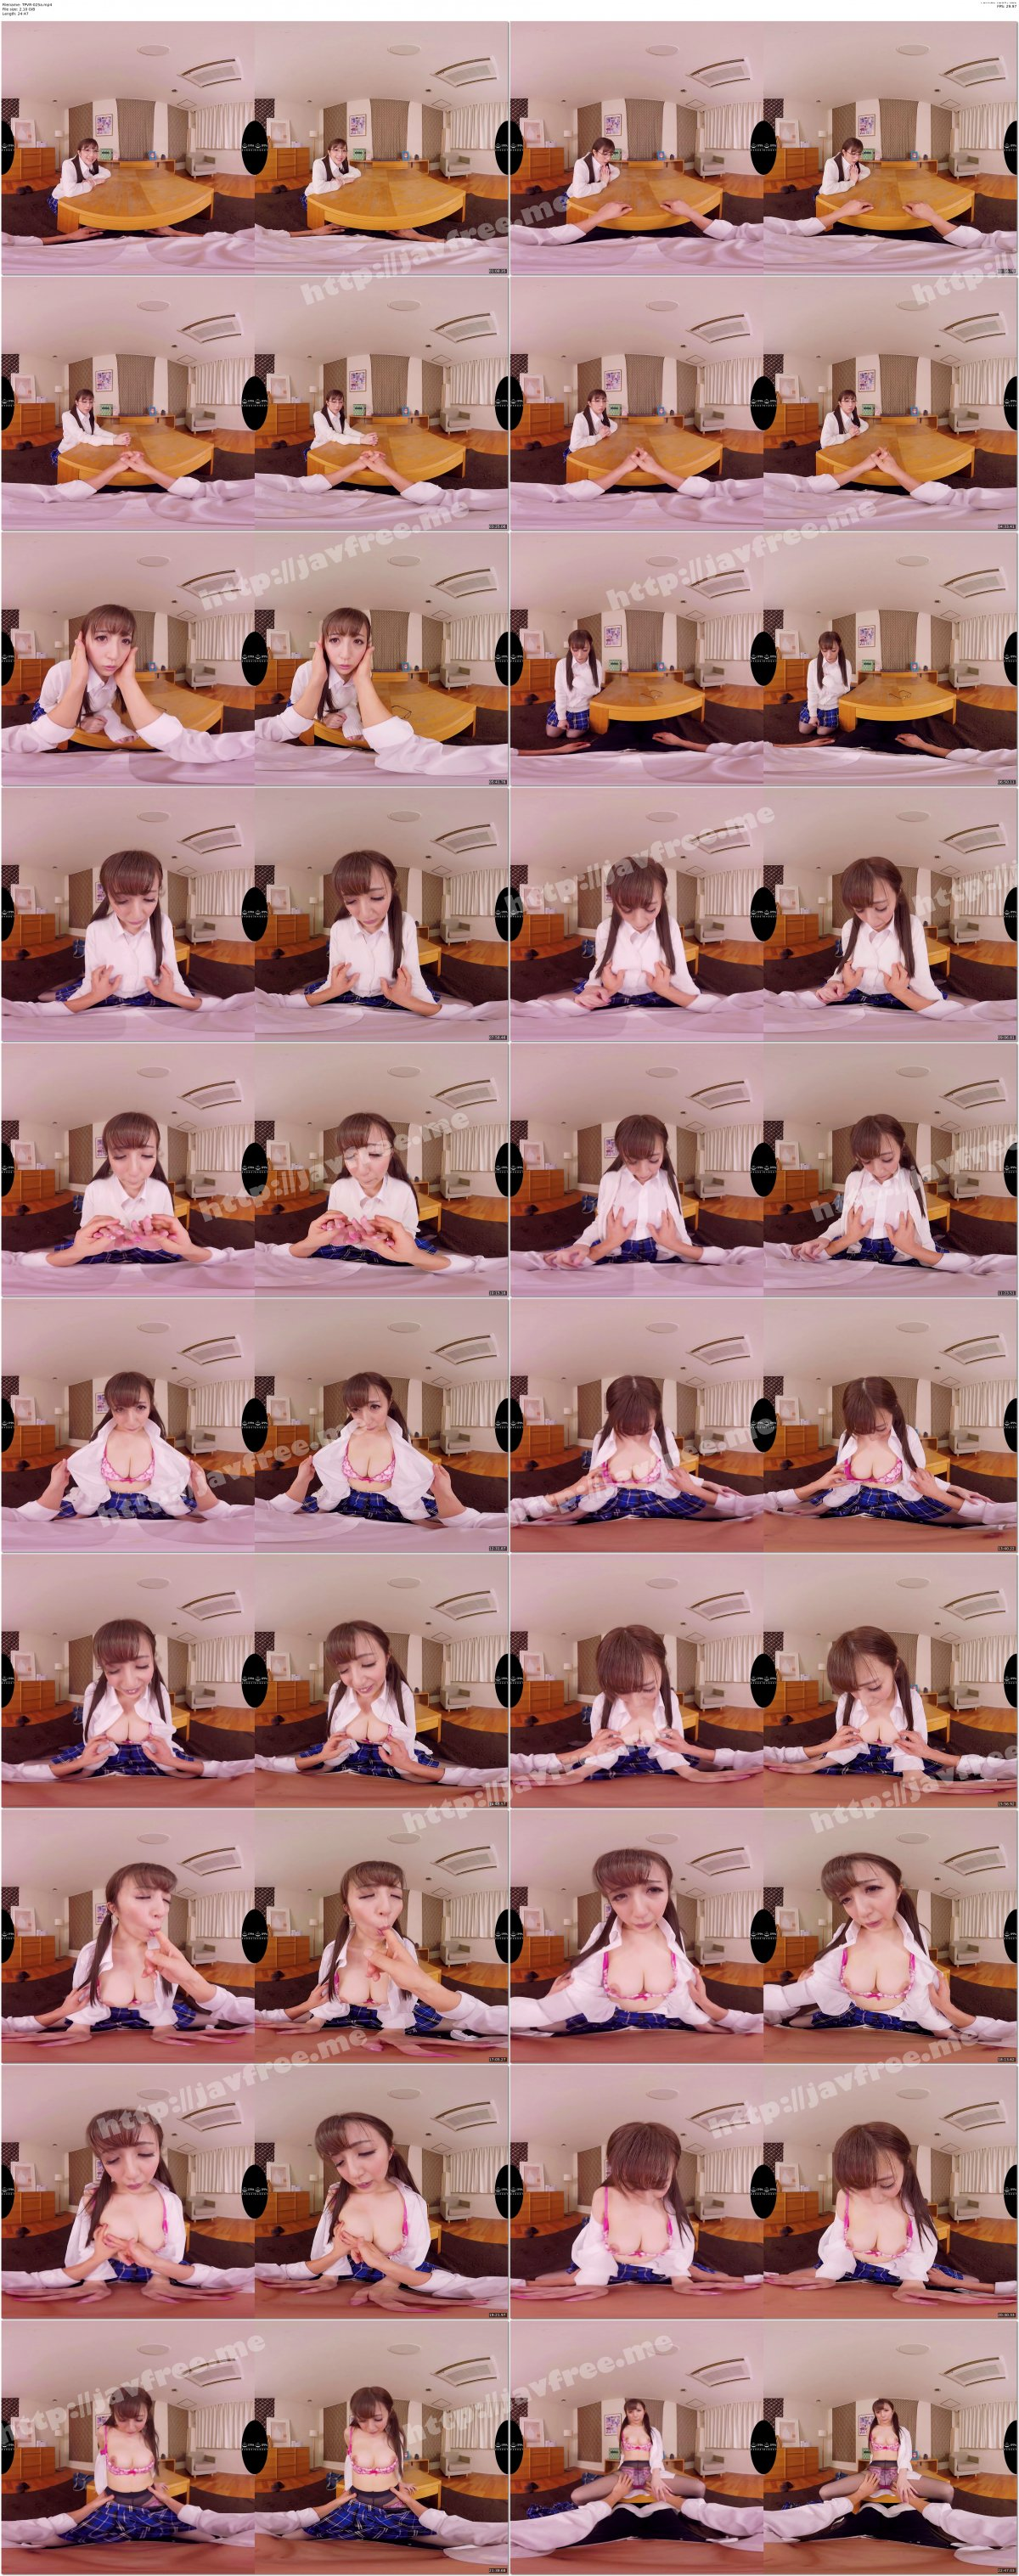 [TPVR-025] 【VR】地味っ娘がメガネを外し覚醒 本当の快感を知る。逢沢まりあ - image TPVR-025a on https://javfree.me